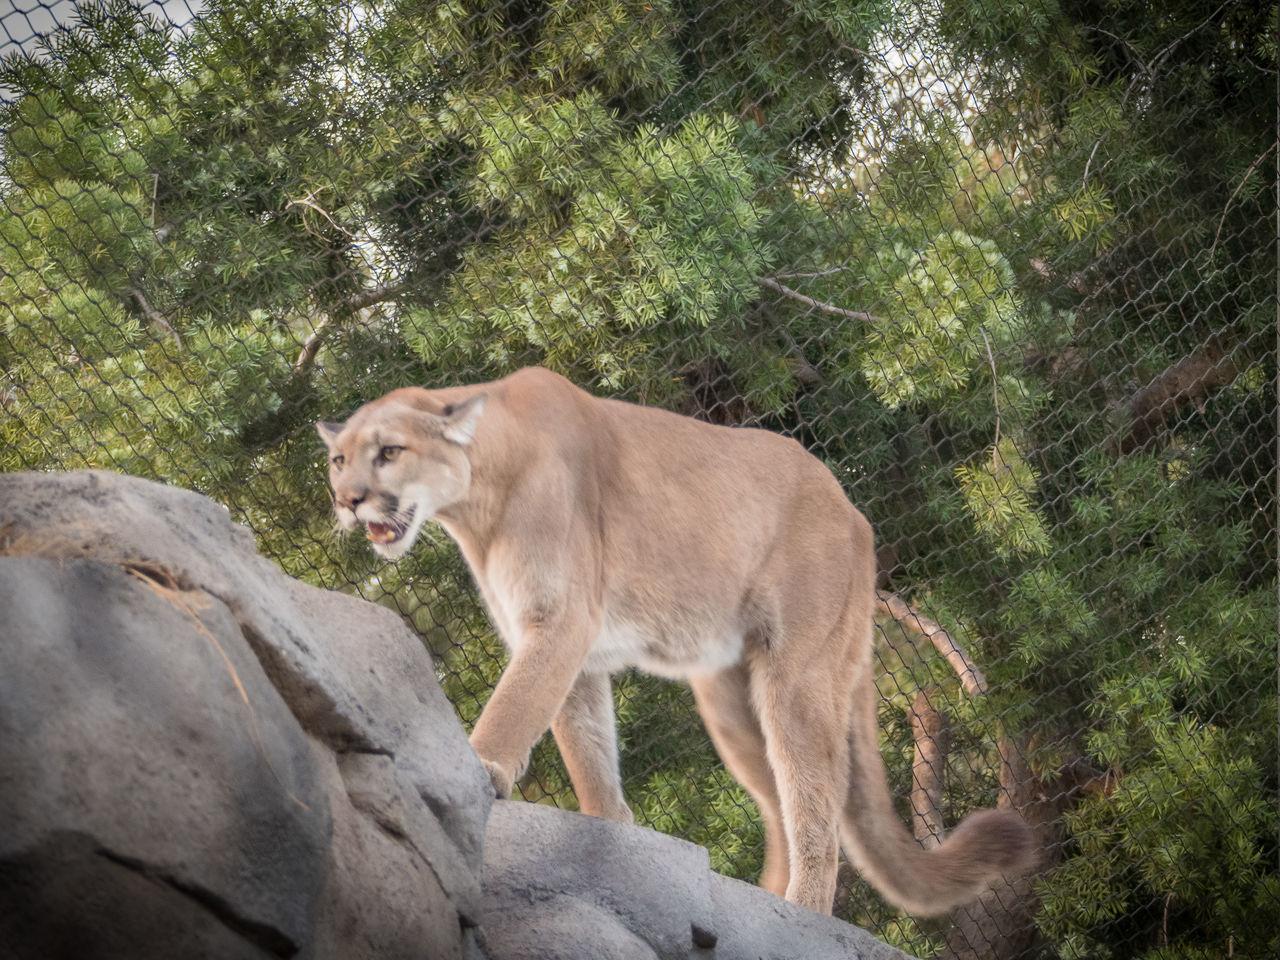 Beautiful stock photos of puma, animal themes, animals in the wild, mammal, one animal